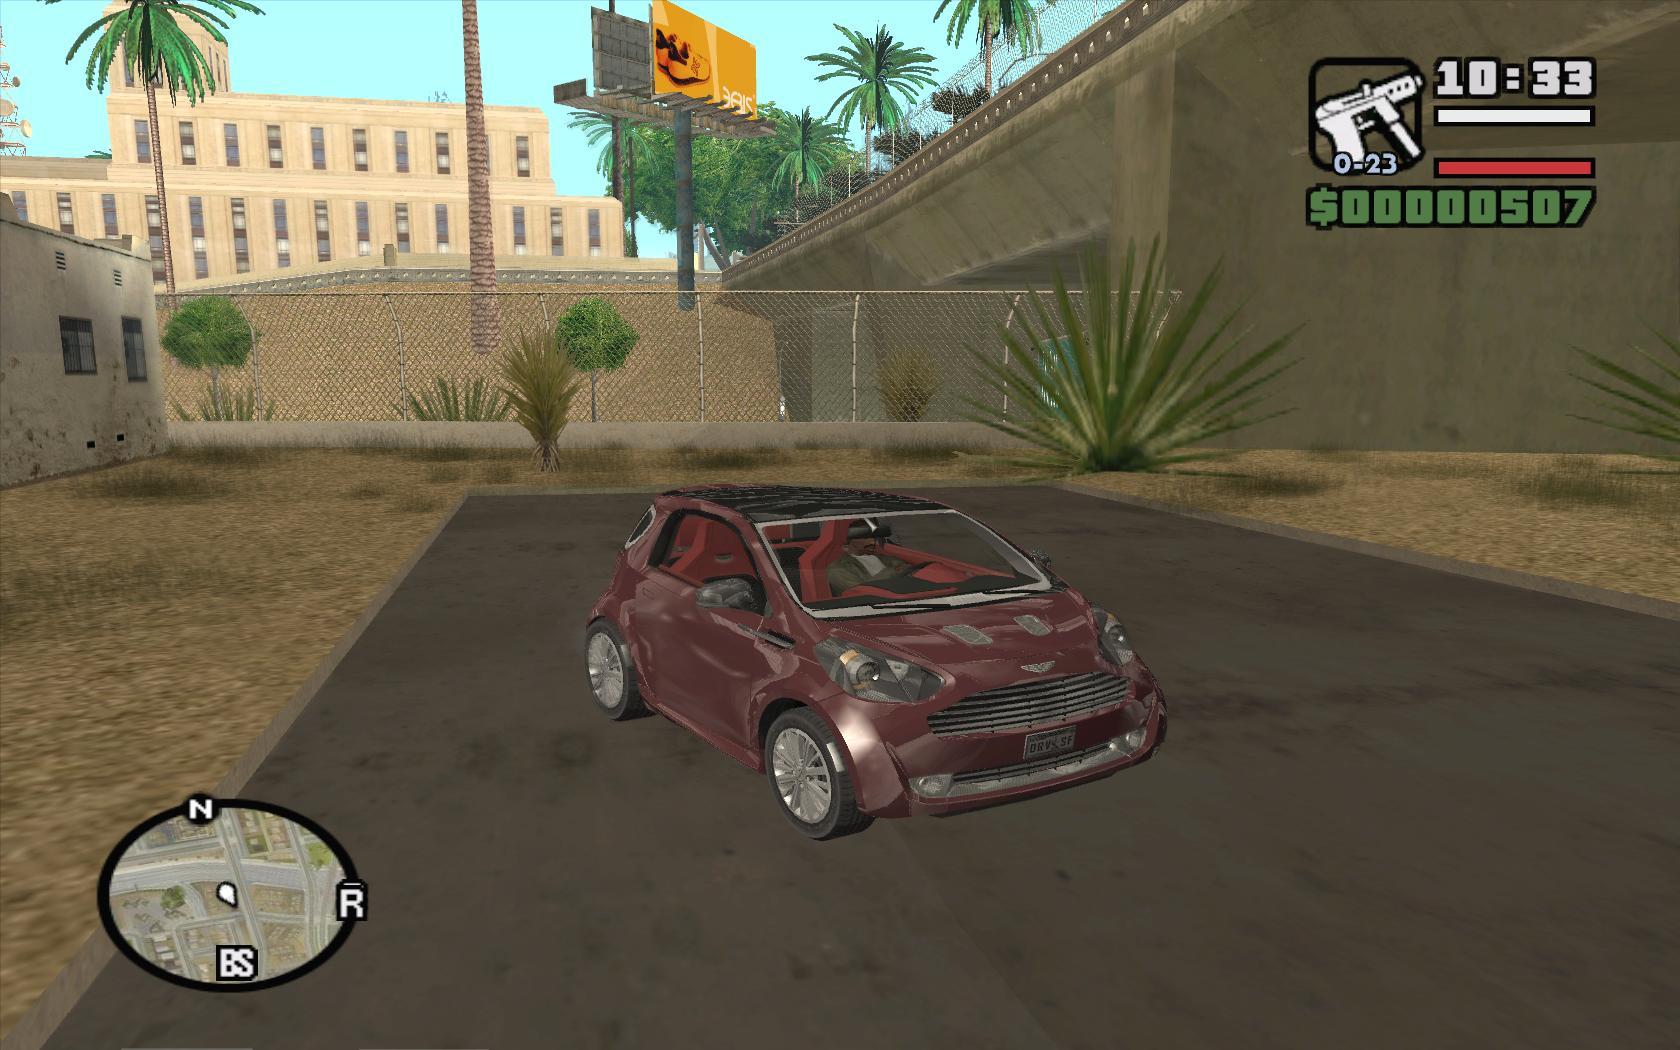 Aston Martin Cygnet - Grand Theft Auto: San Andreas